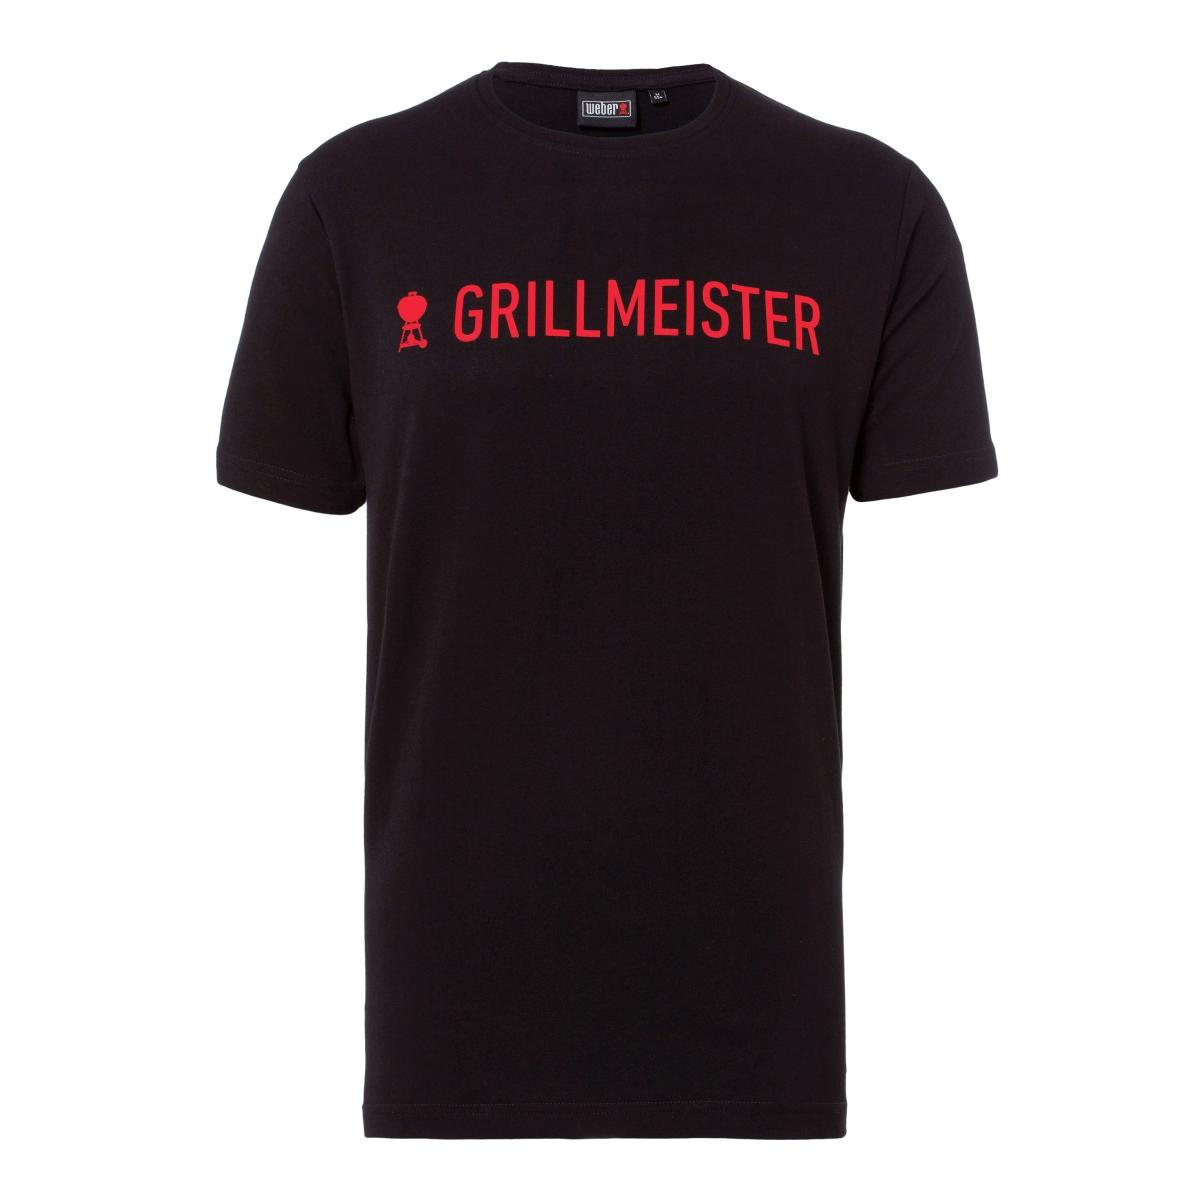 "T-Shirt ""Grillmeister"" Stretch ID0594 men's, XXXL"